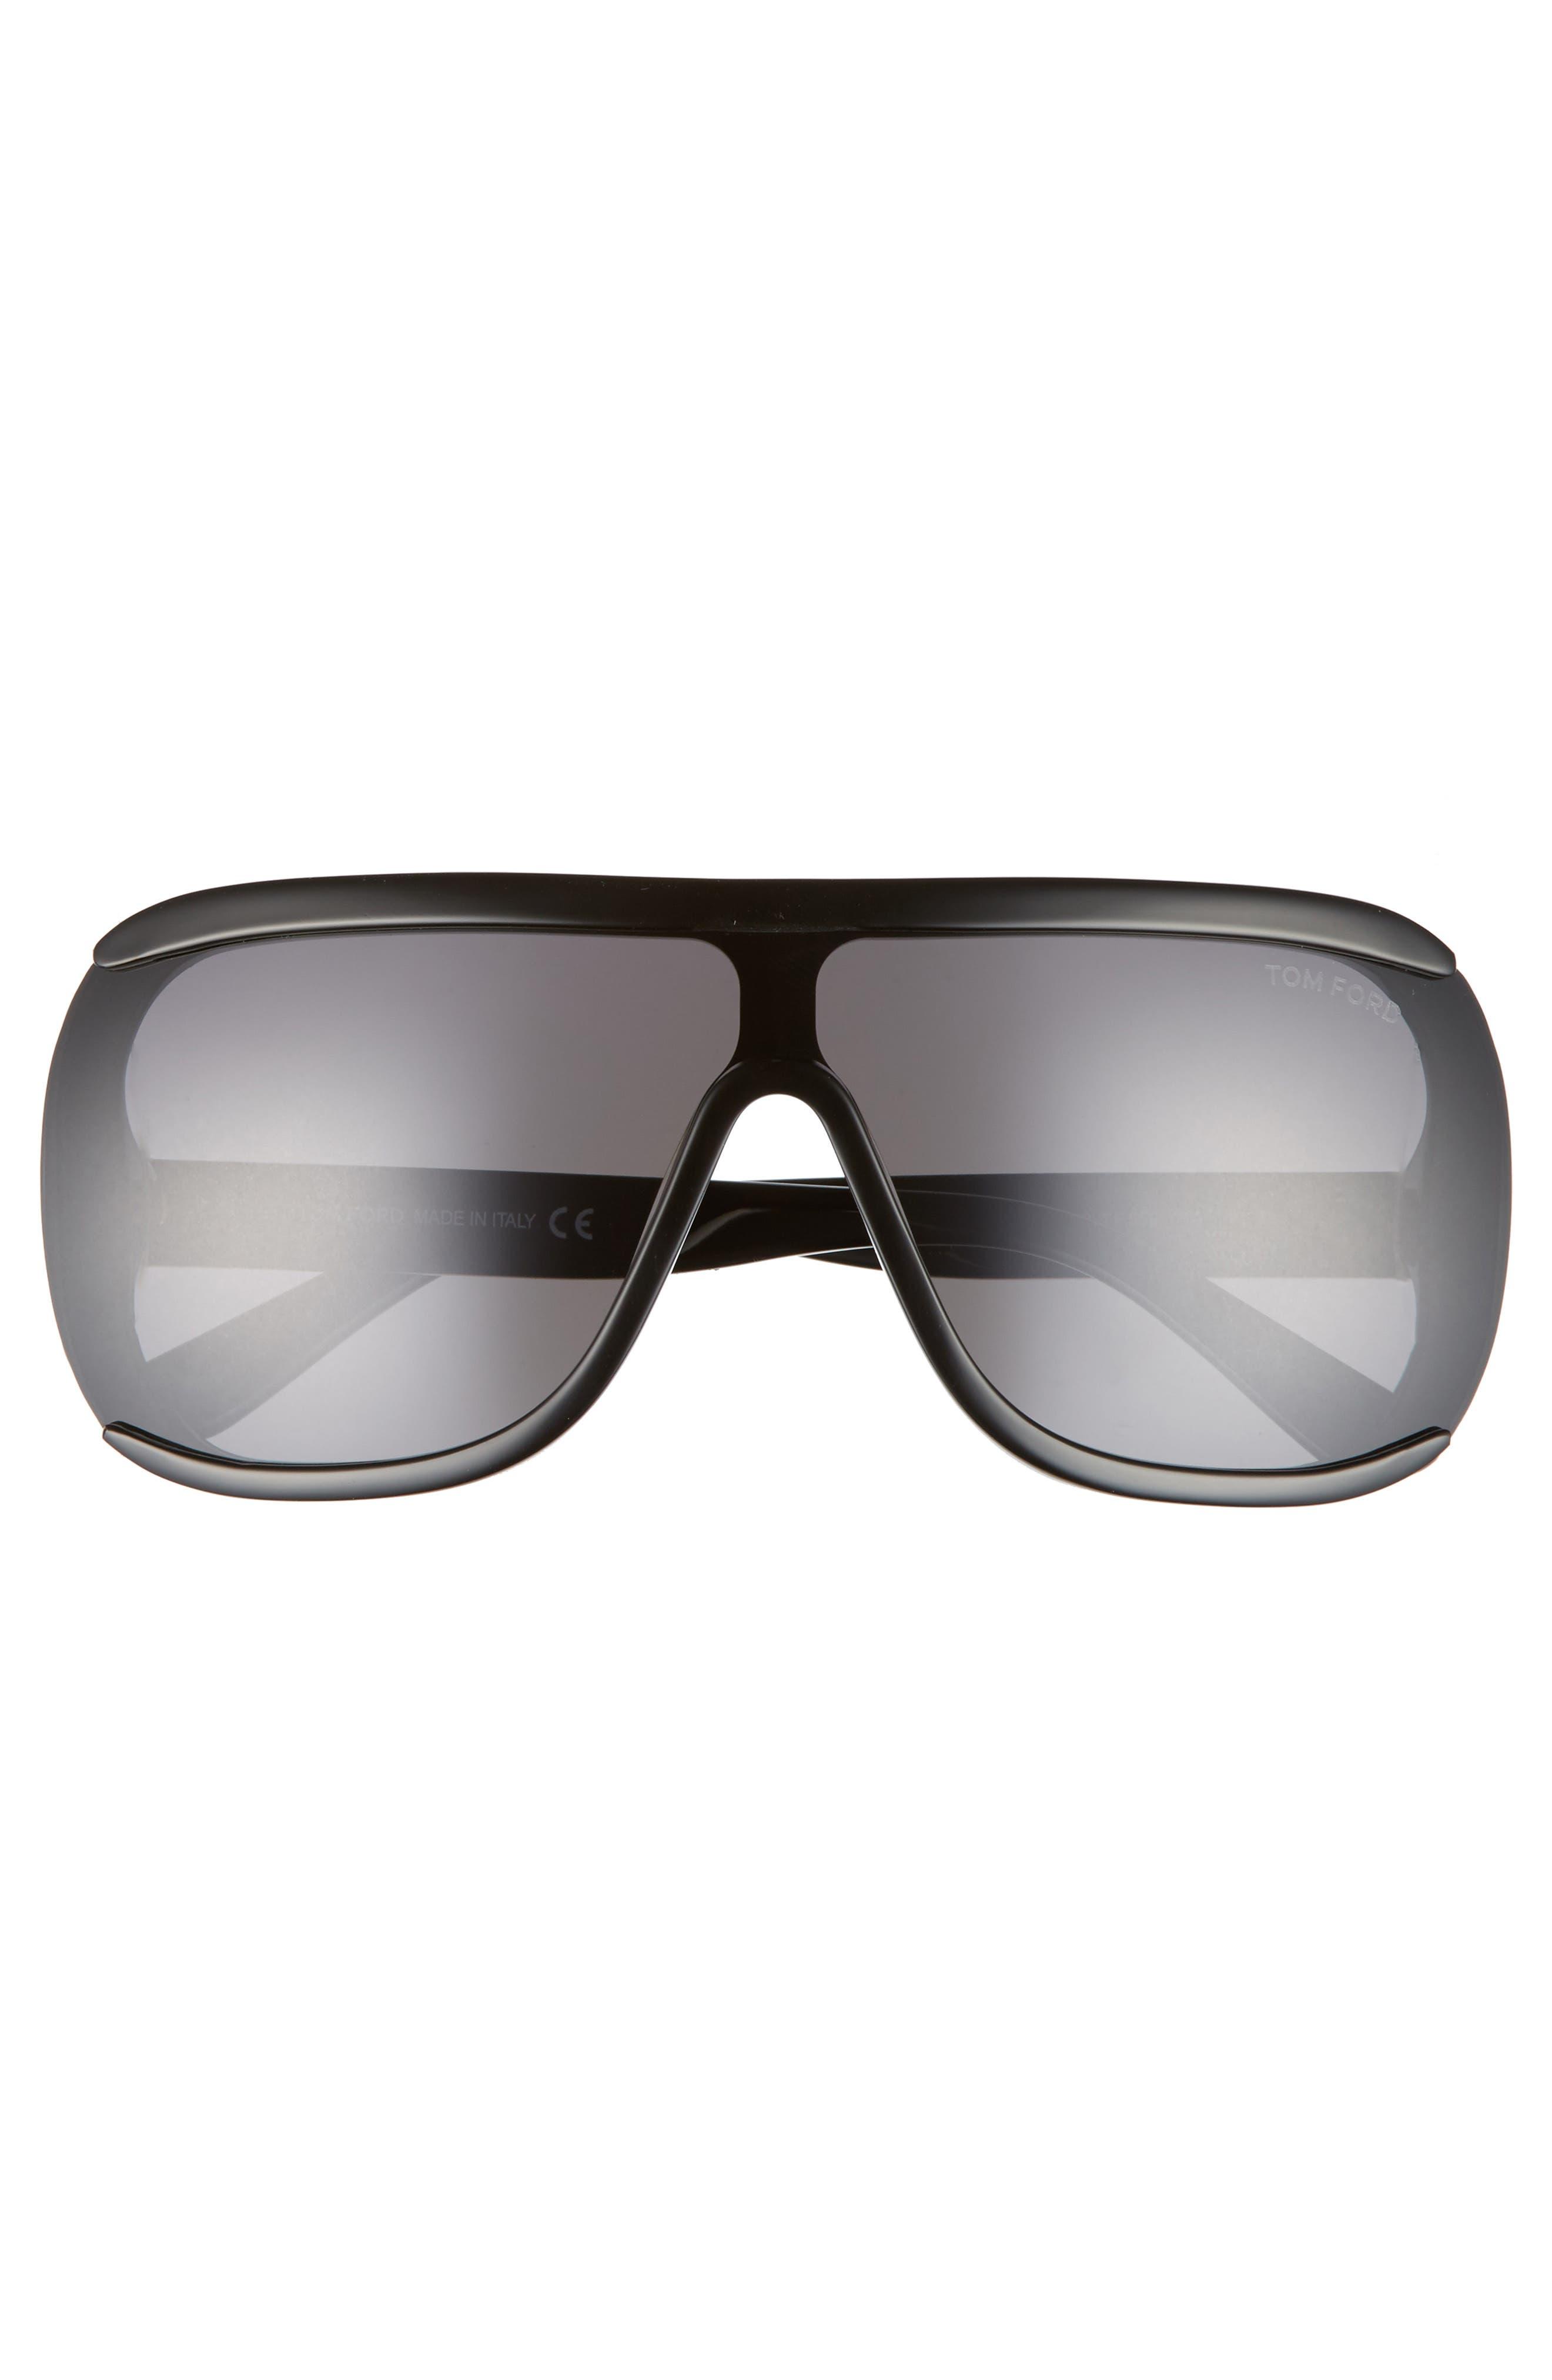 TOM FORD,                             Porfirio 65mm One-Piece Lens Shield Sunglasses,                             Alternate thumbnail 3, color,                             001